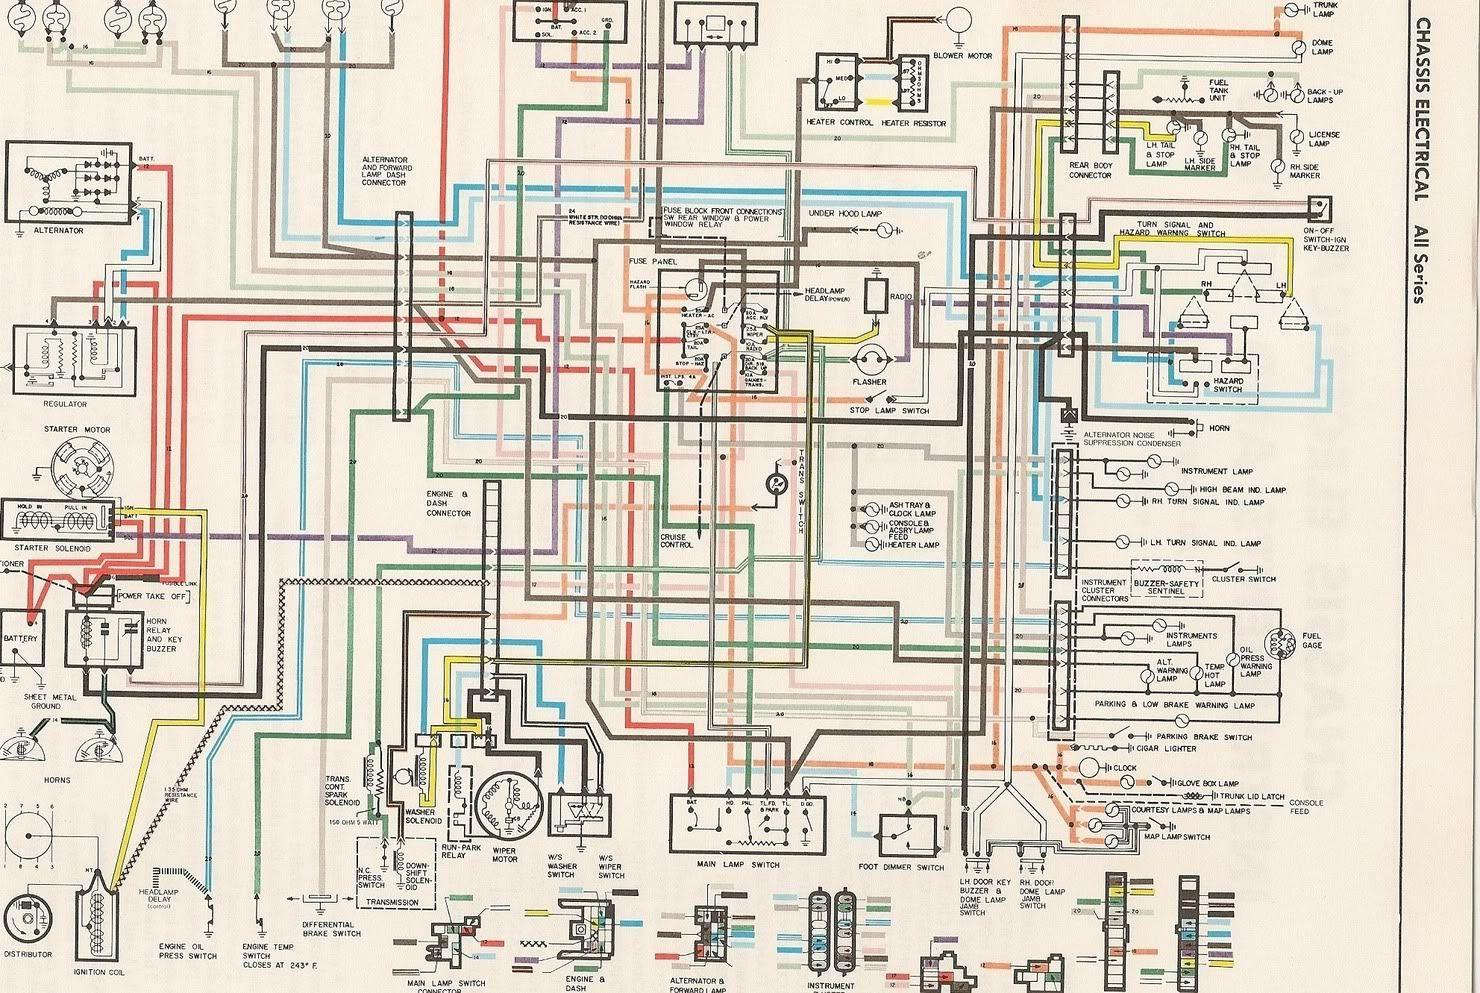 wiring diagram Pinto | Misc | Diagram, Wire, Floor plans